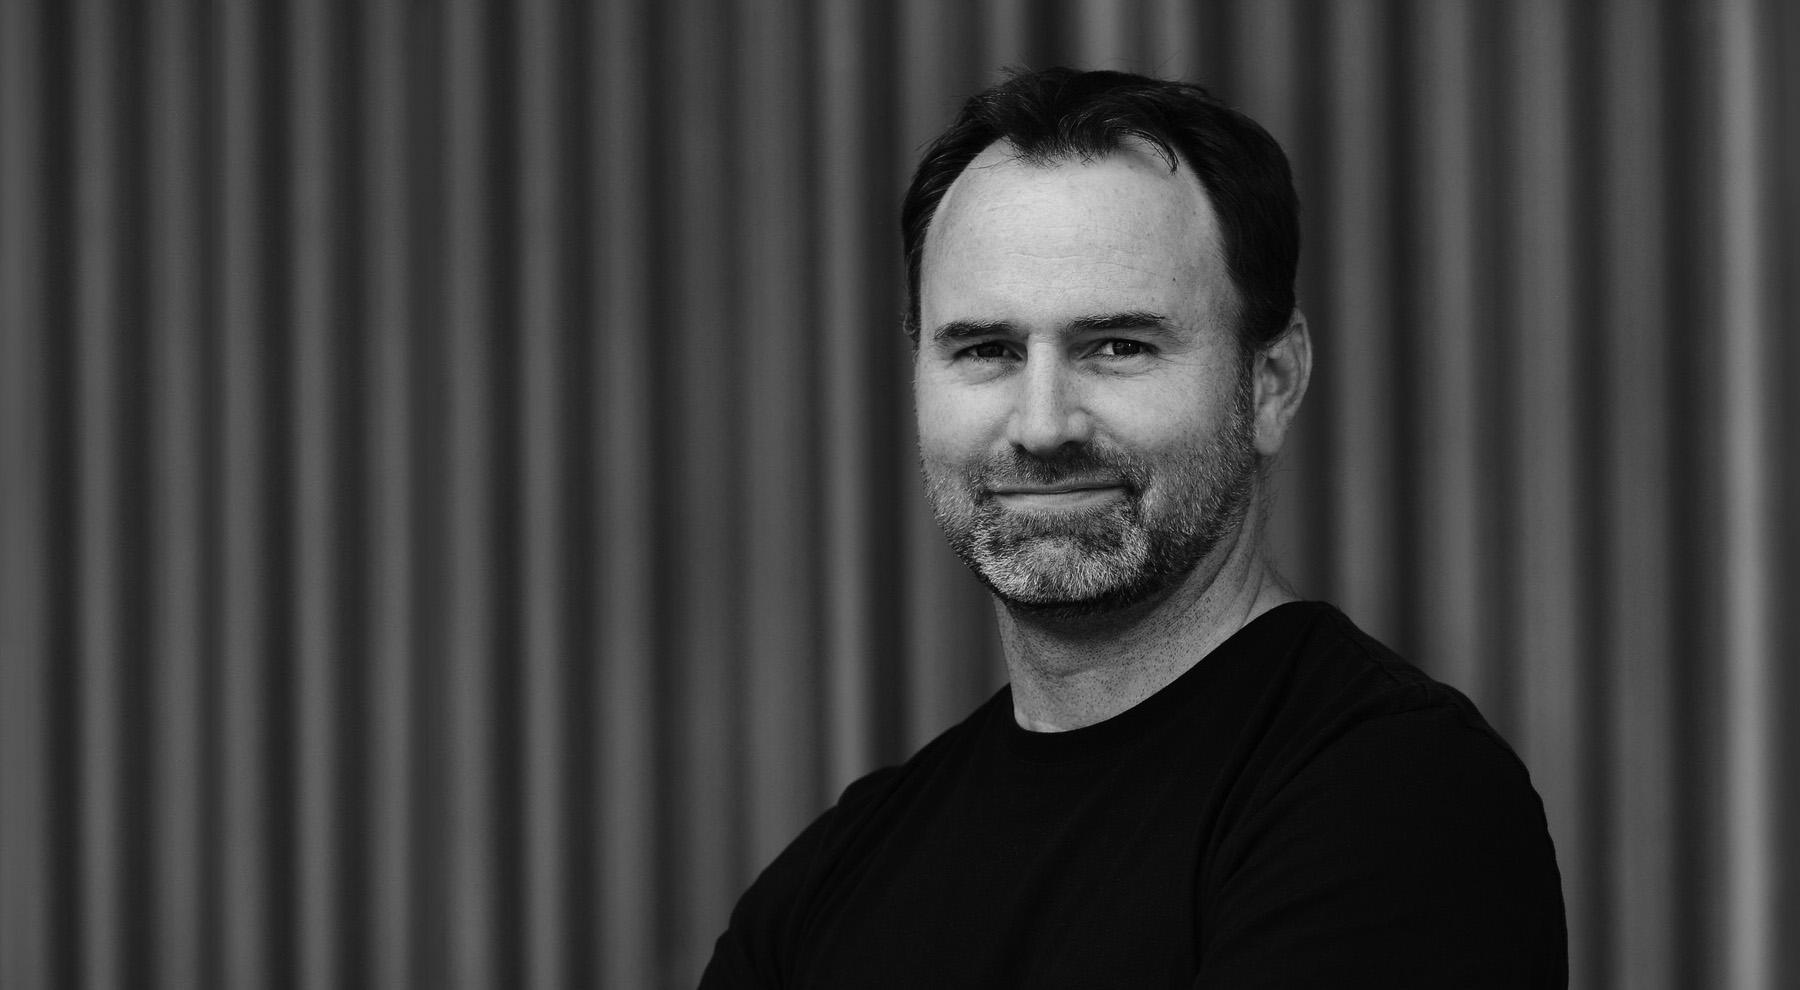 Matt Pearson, AIA, RIBA, Senior Design Architect at Clark Nexsen